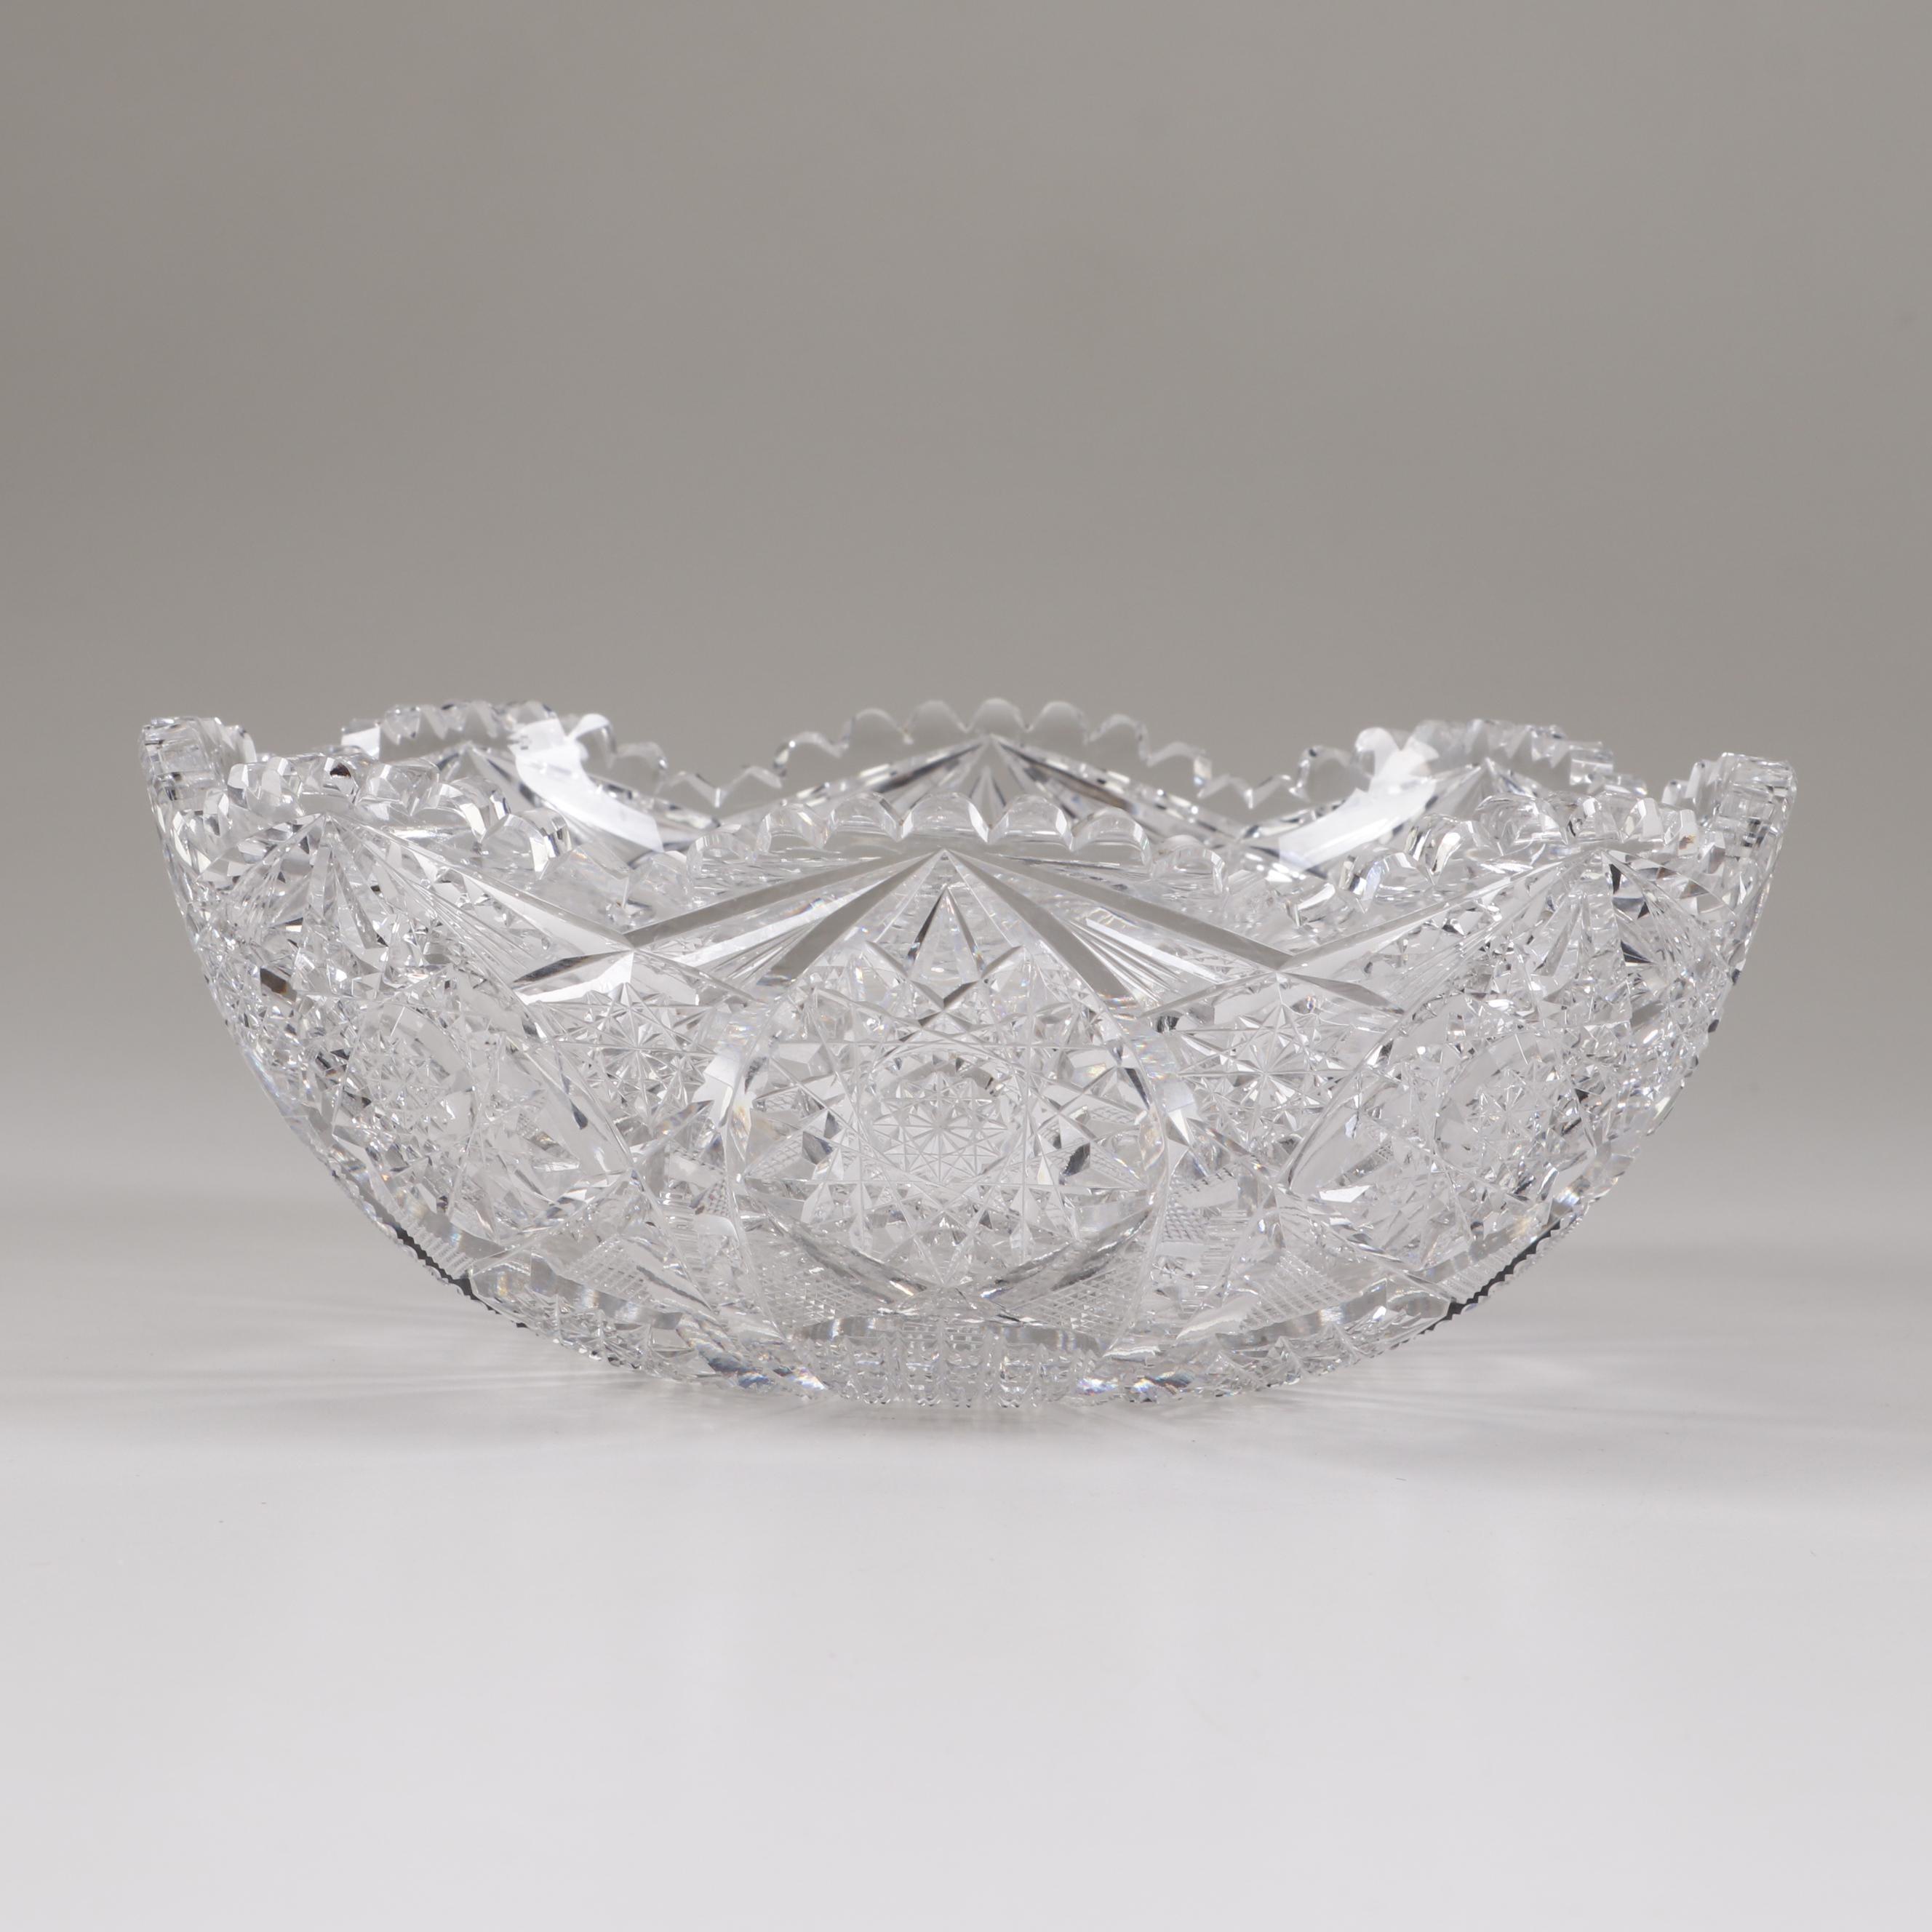 American Brilliant Period Cut Glass Bowl, Late 19th Century